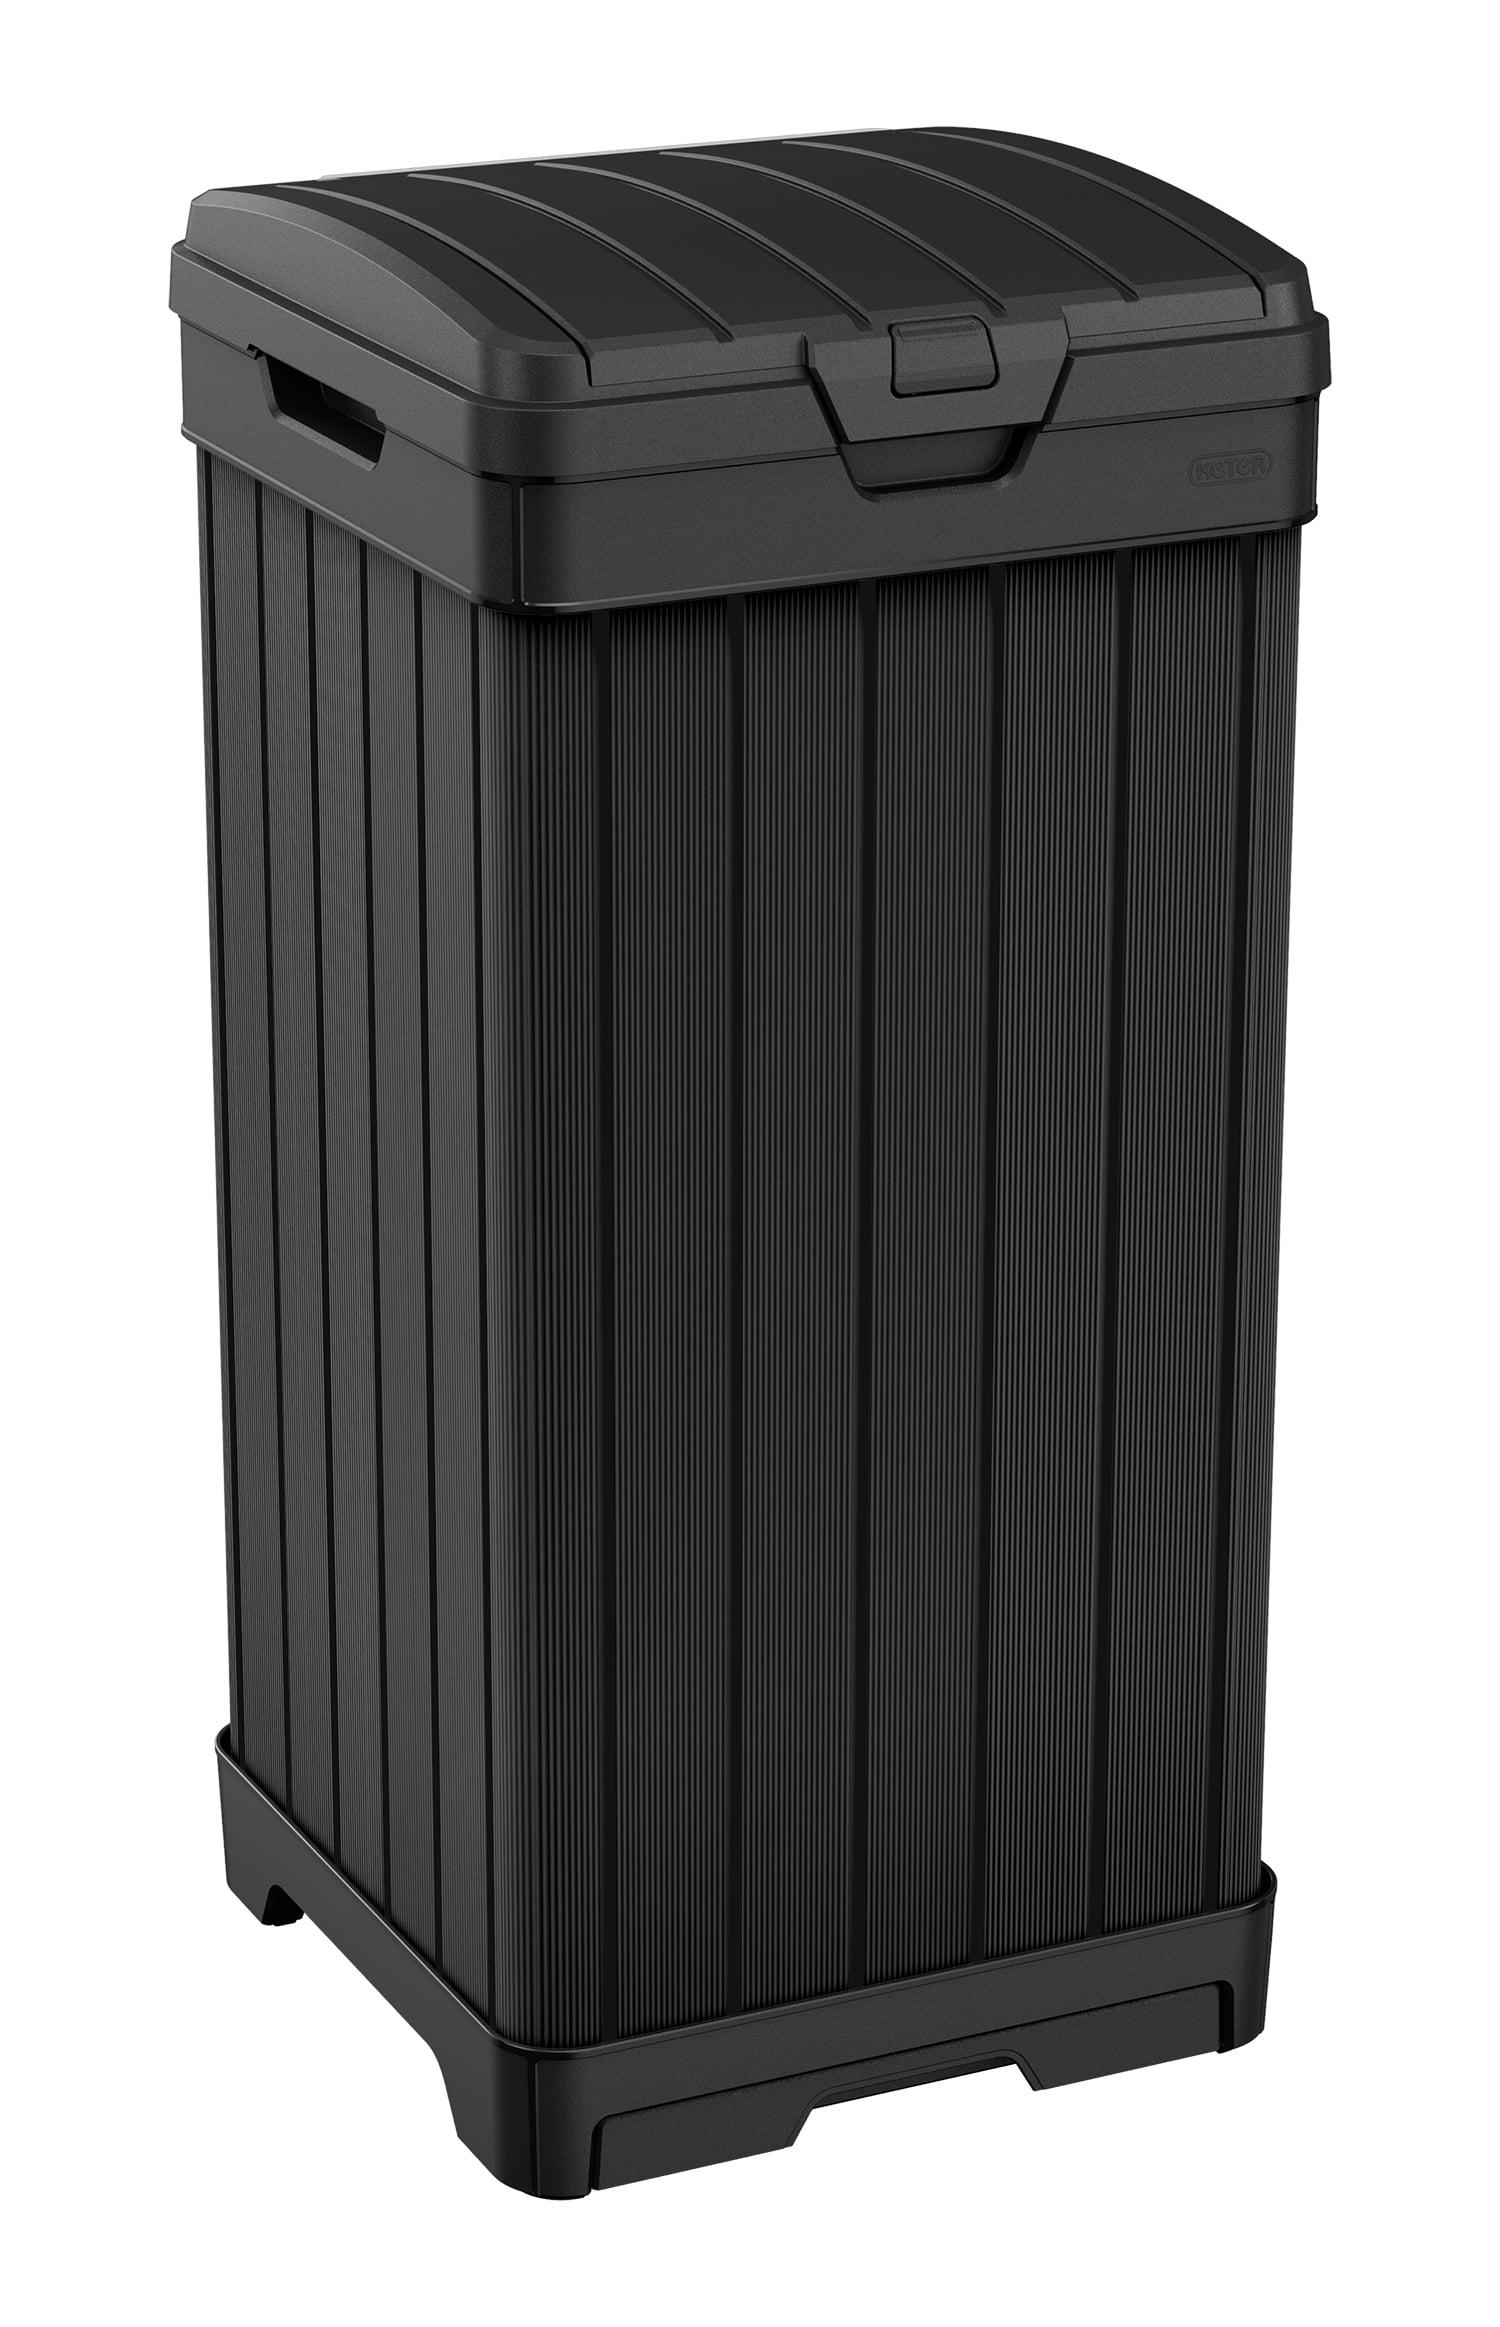 Keter Baltimore Duotech Outdoor Trash Can Resin Wastebin Black Woodlook Walmart Com Walmart Com